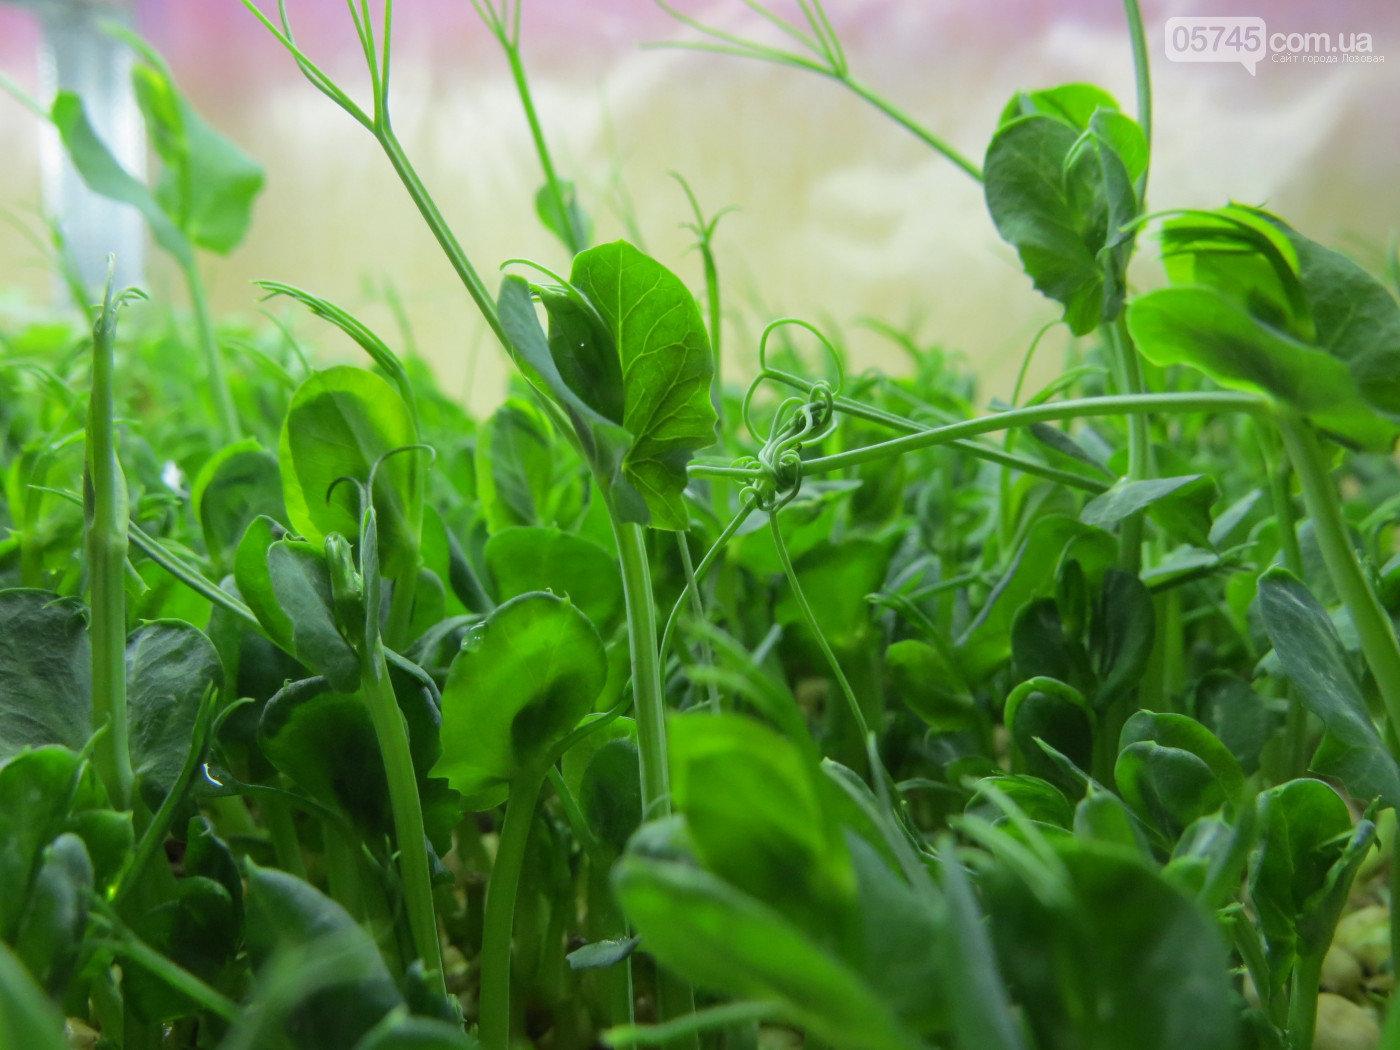 Вкусно, красиво, полезно: лозовчанка Елена Балахнина выращивает микрозелень, фото-2